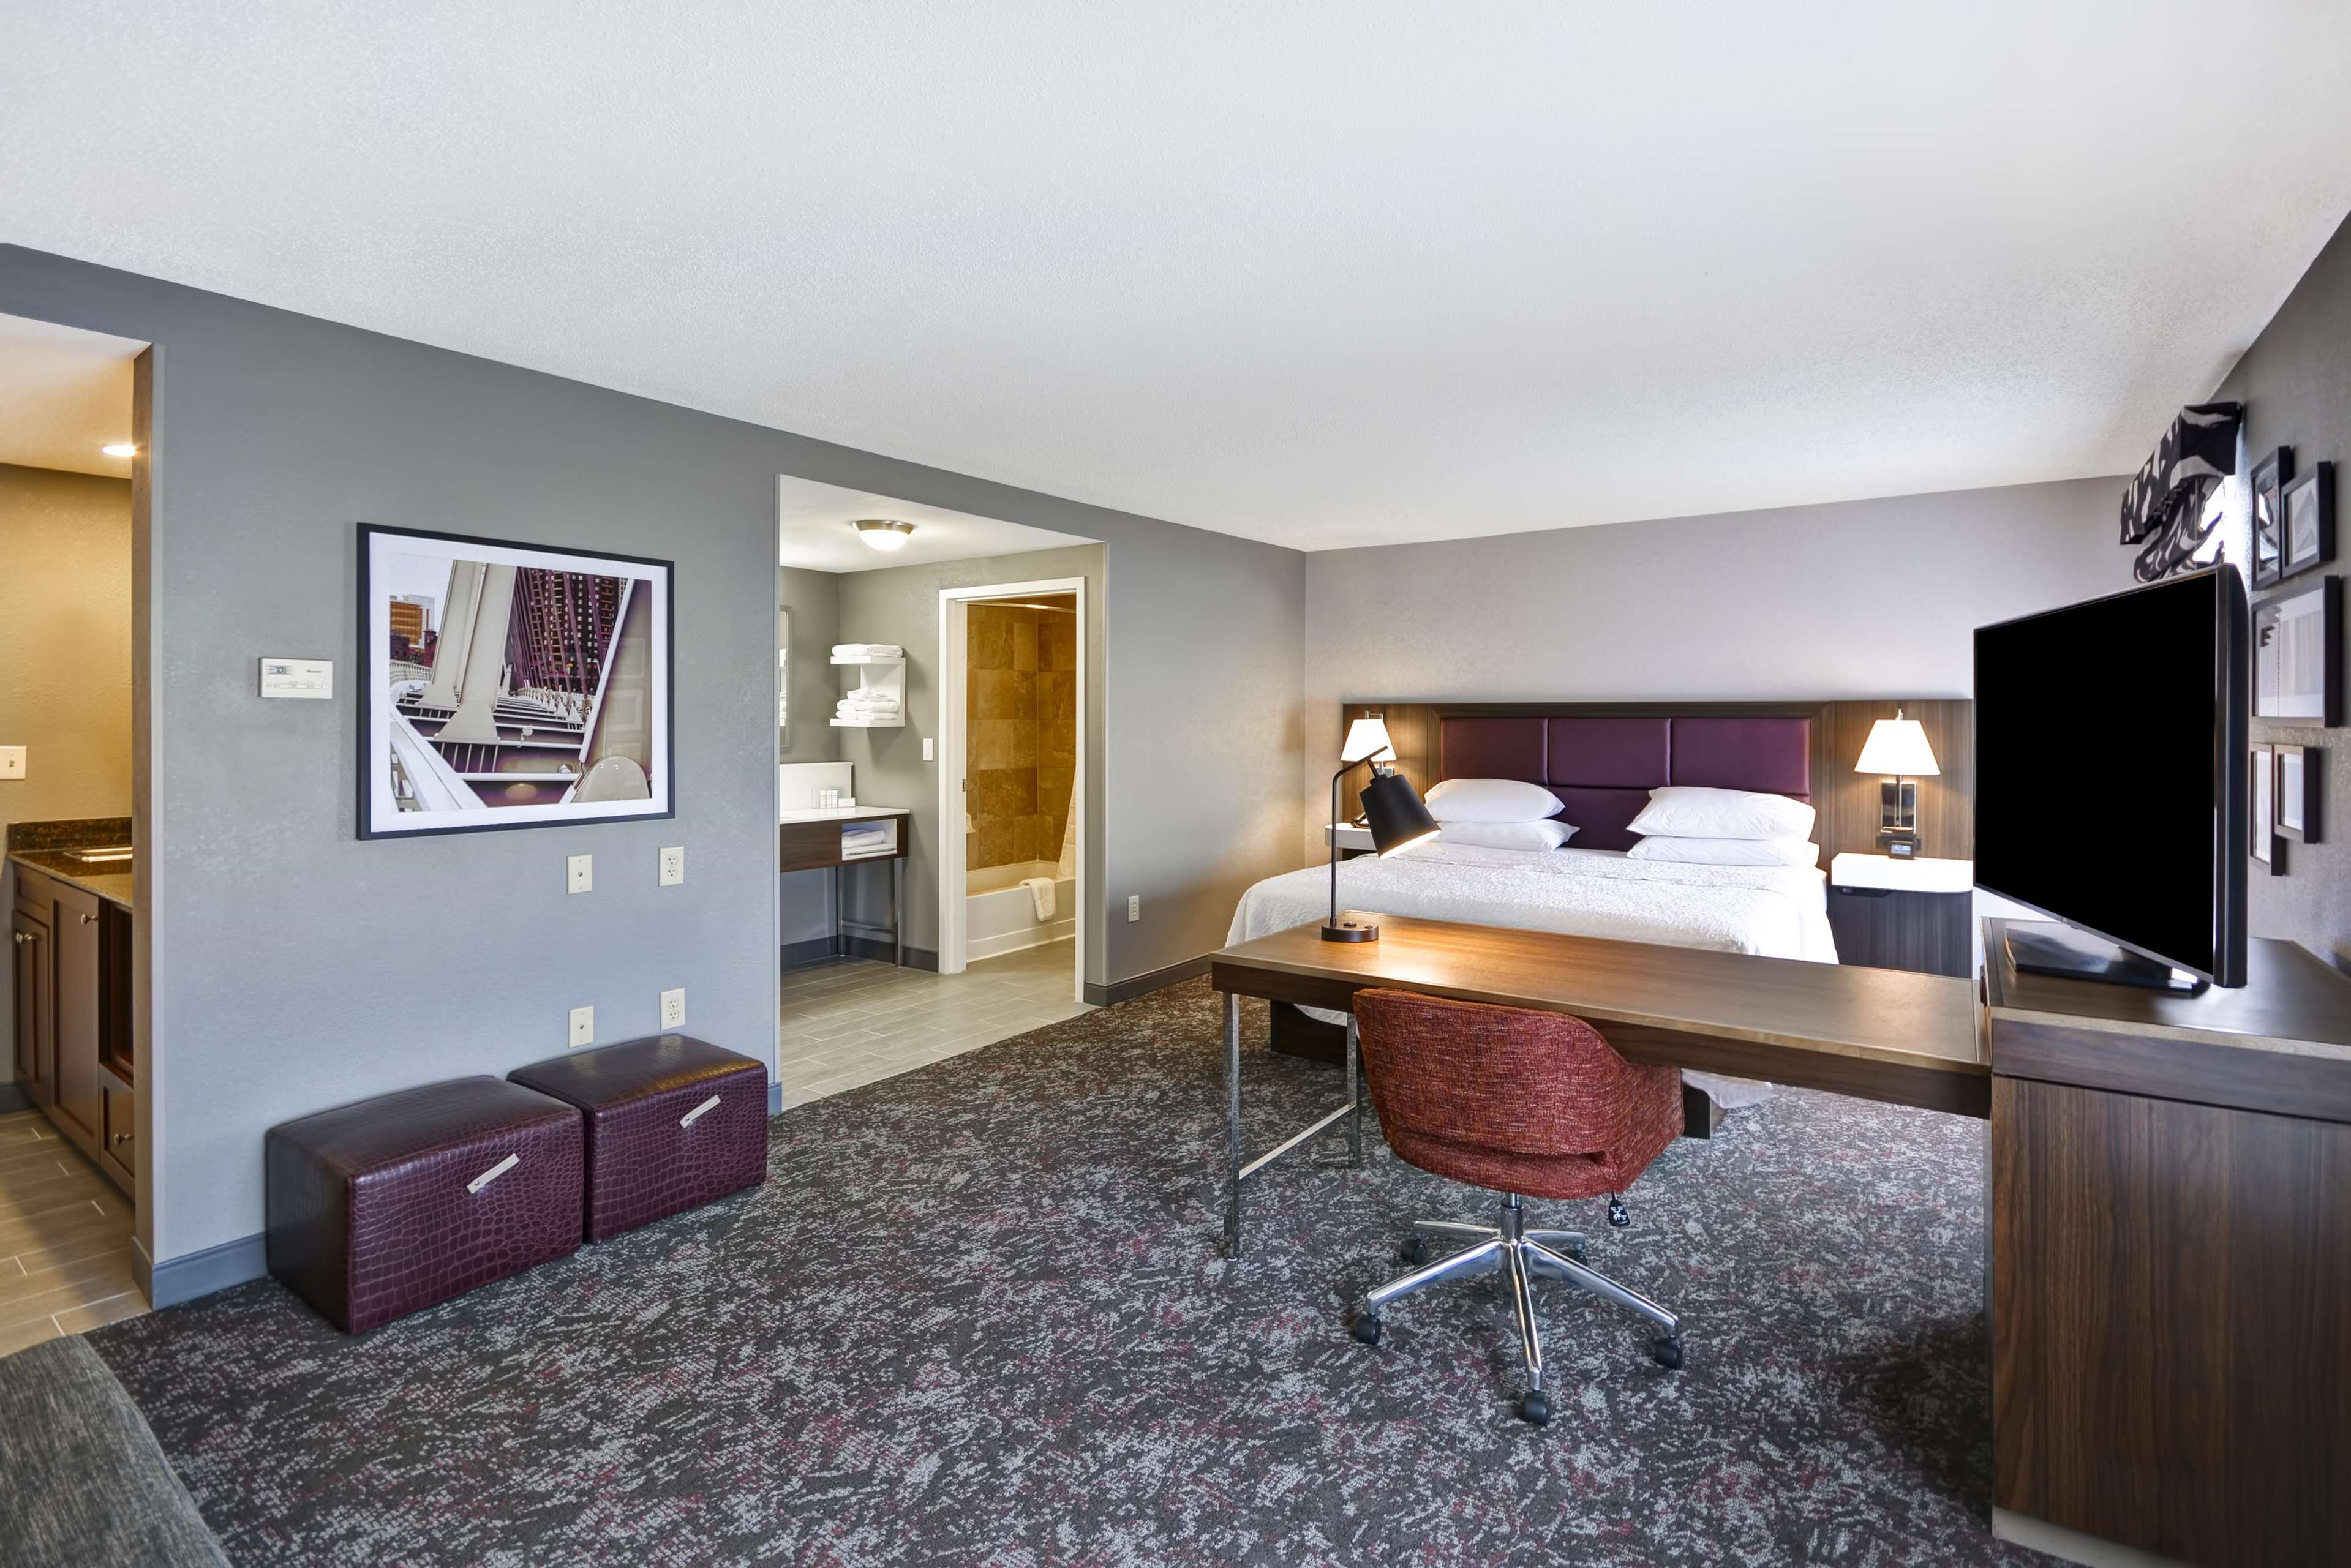 Hampton Inn & Suites Columbus-Easton Area image 56